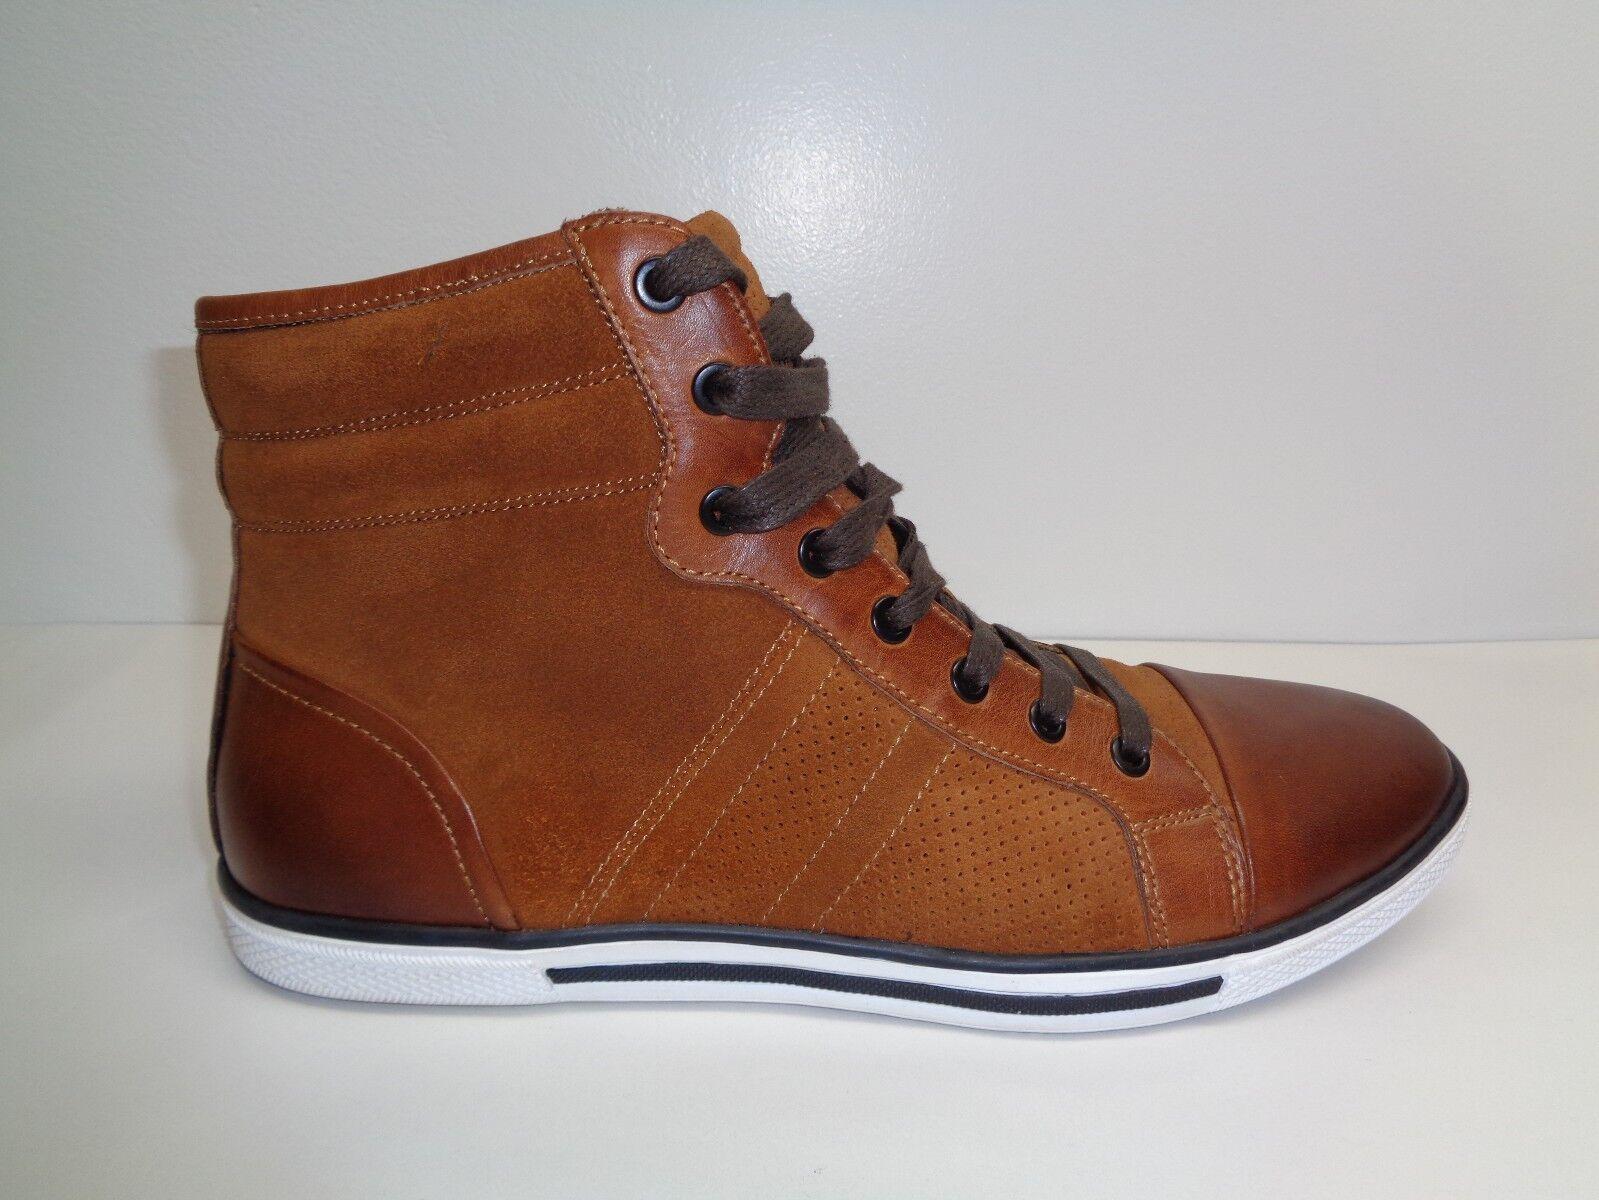 Kenneth Cole Sze 11.5 BASE DOWN LOW Rust Pelle Fashion Scarpe da Ginnastica New Uomo Scarpe